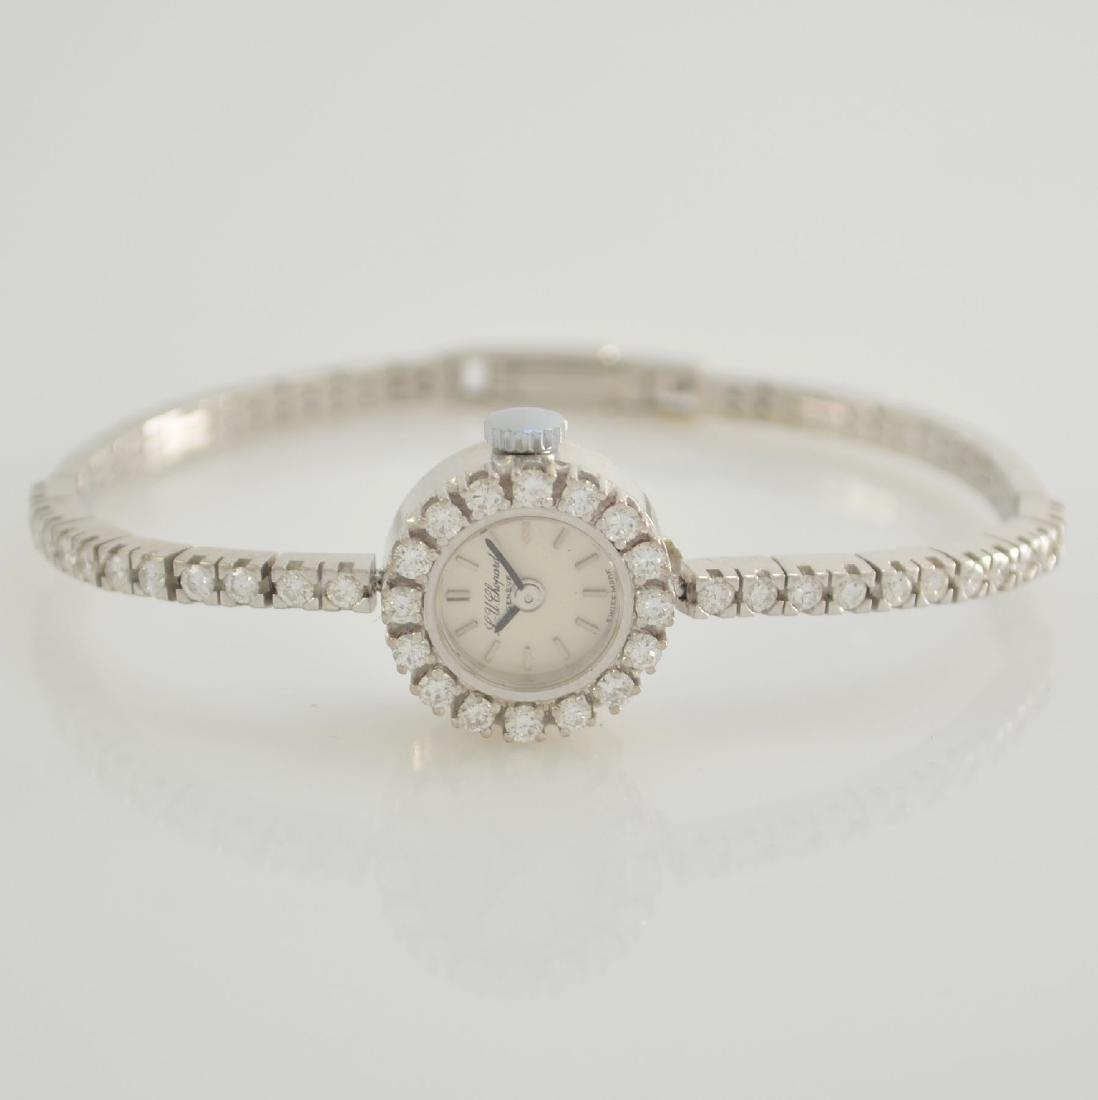 CHOPARD 18k white gold diamond set ladies wristwatch